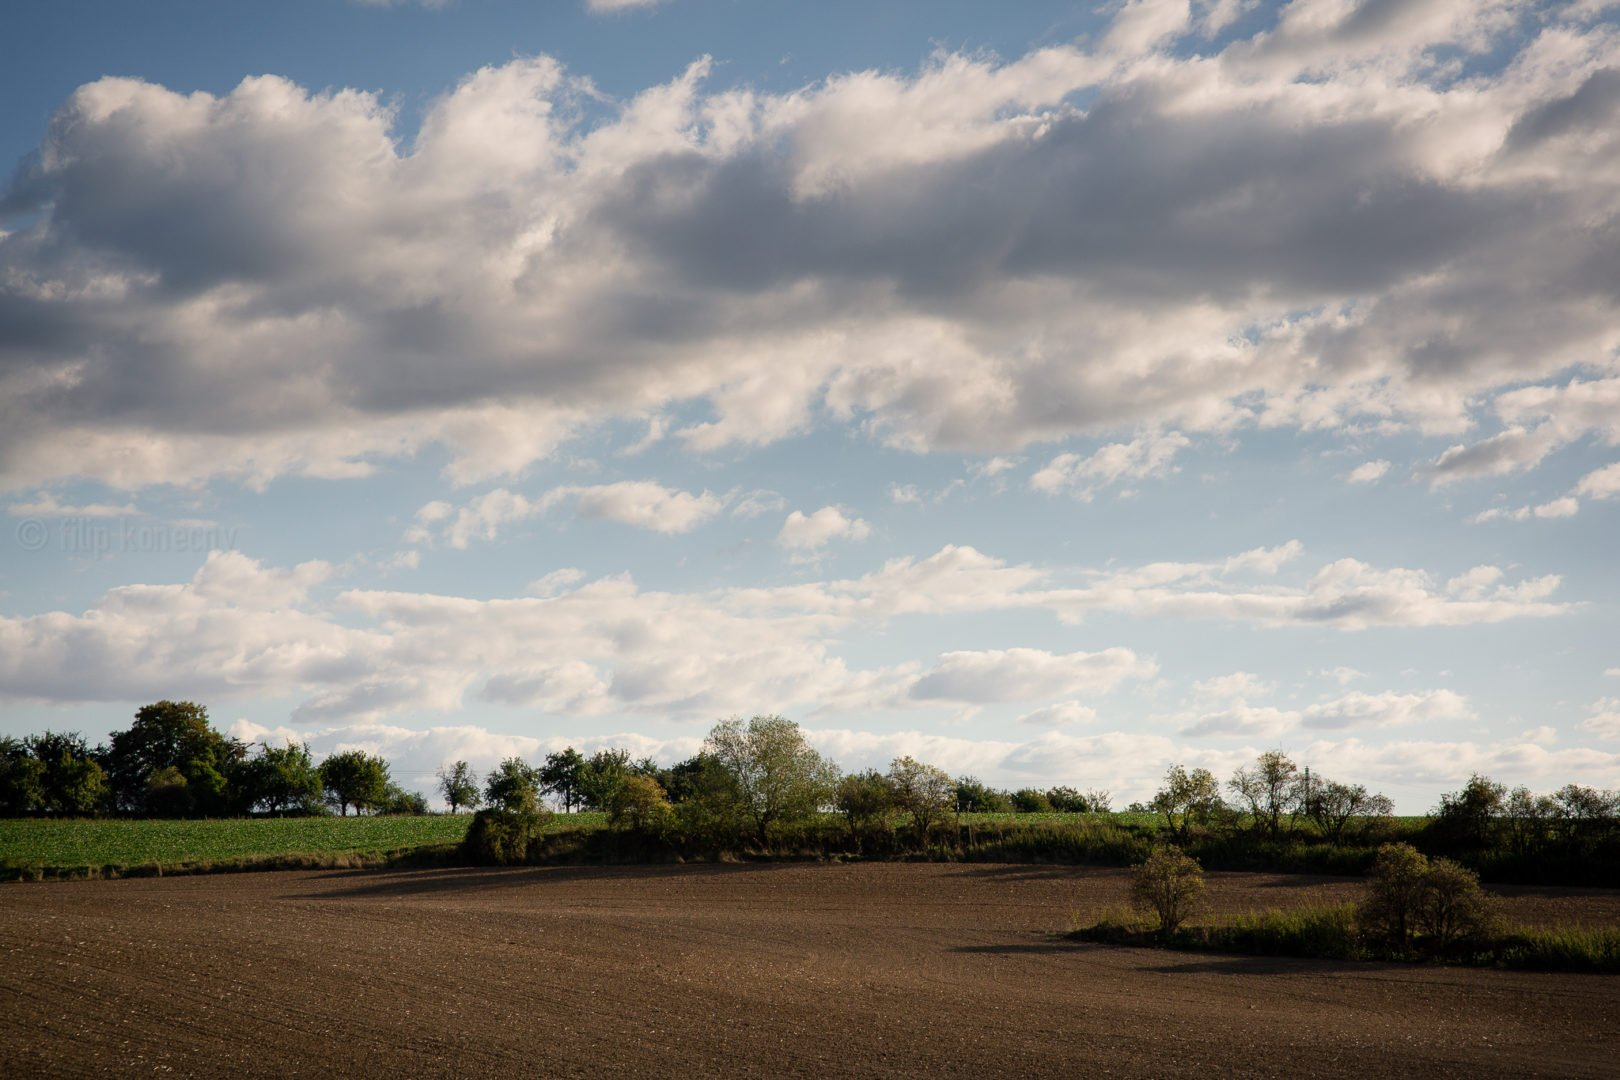 landscape of crop field at uvaly u prahy